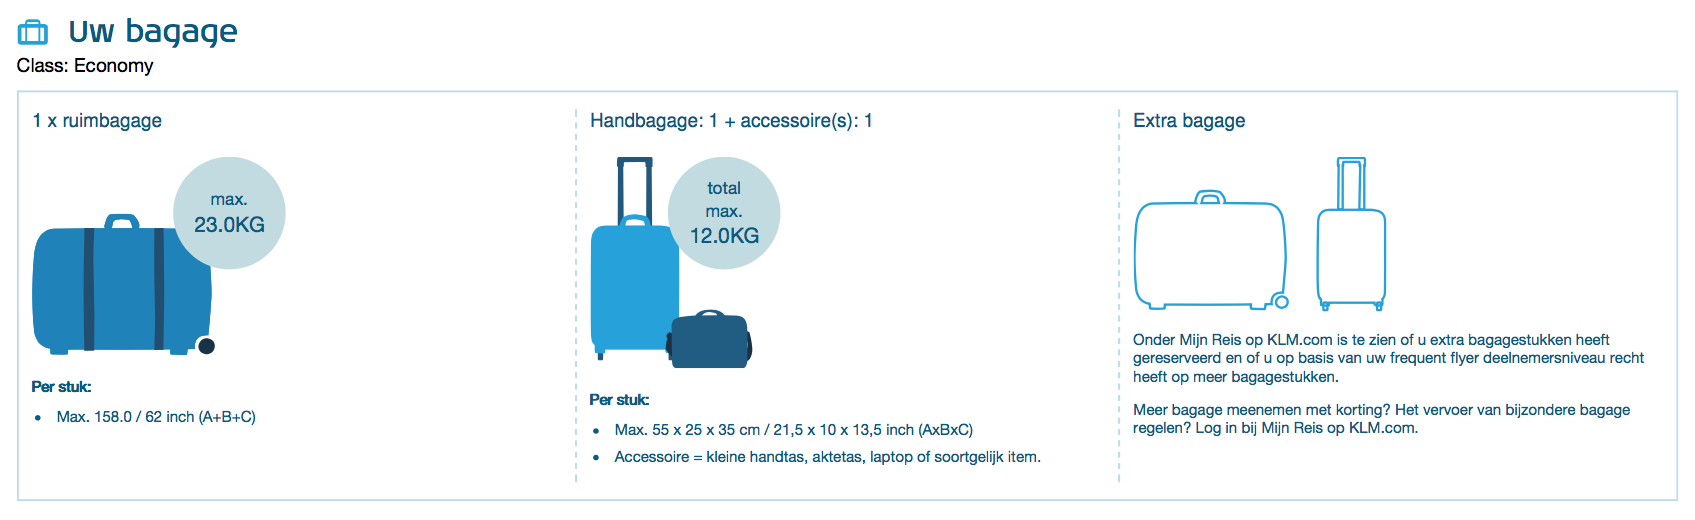 KLM Economy class - Bagage informatie